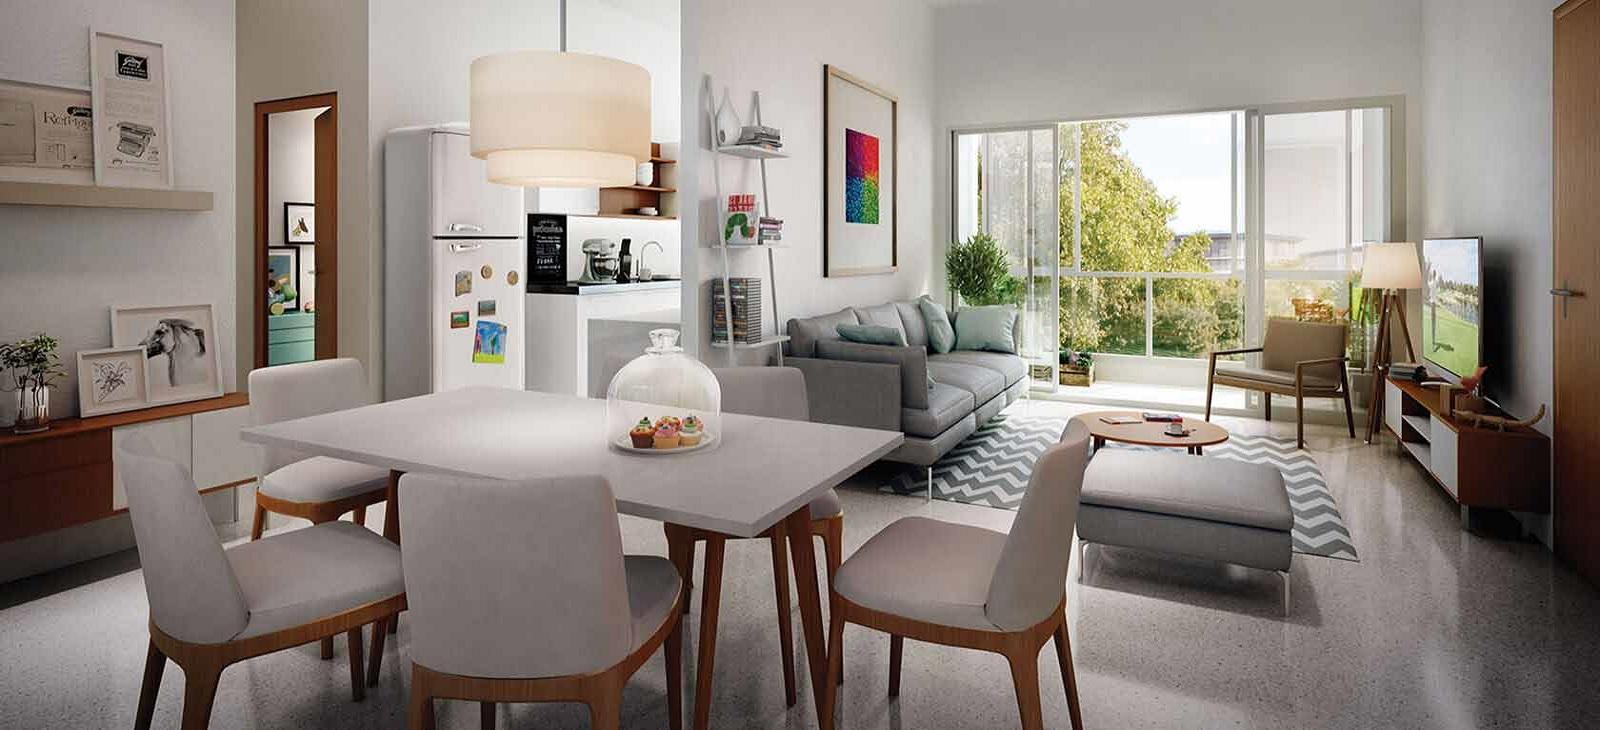 godrej the trees apartment interiors40